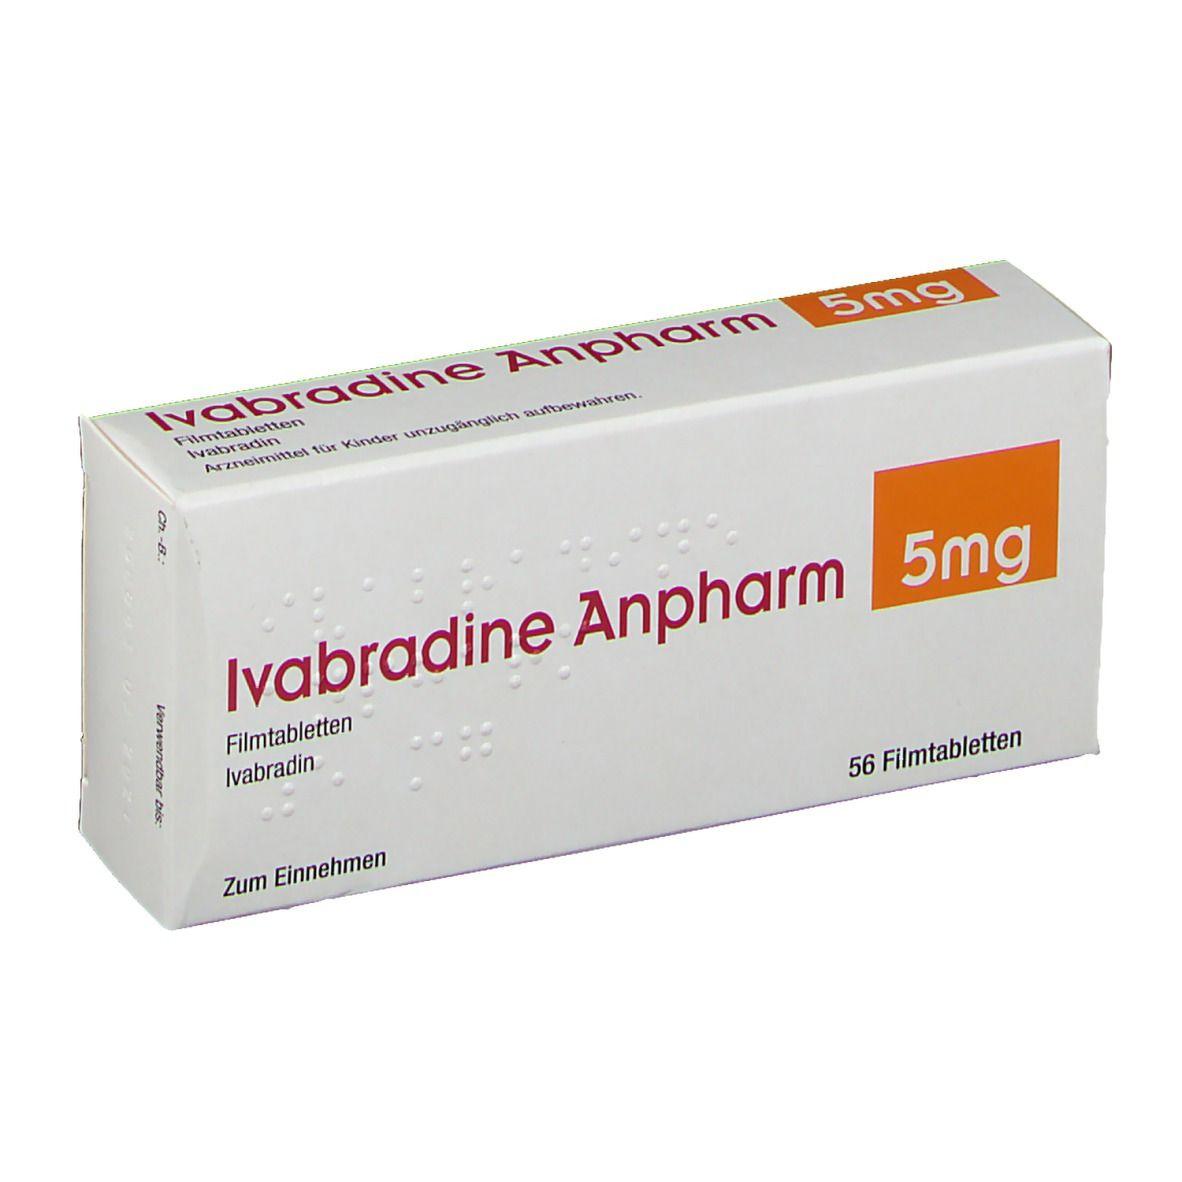 Ivabradine Anpharm 20 mg 20 St   shop apotheke.com